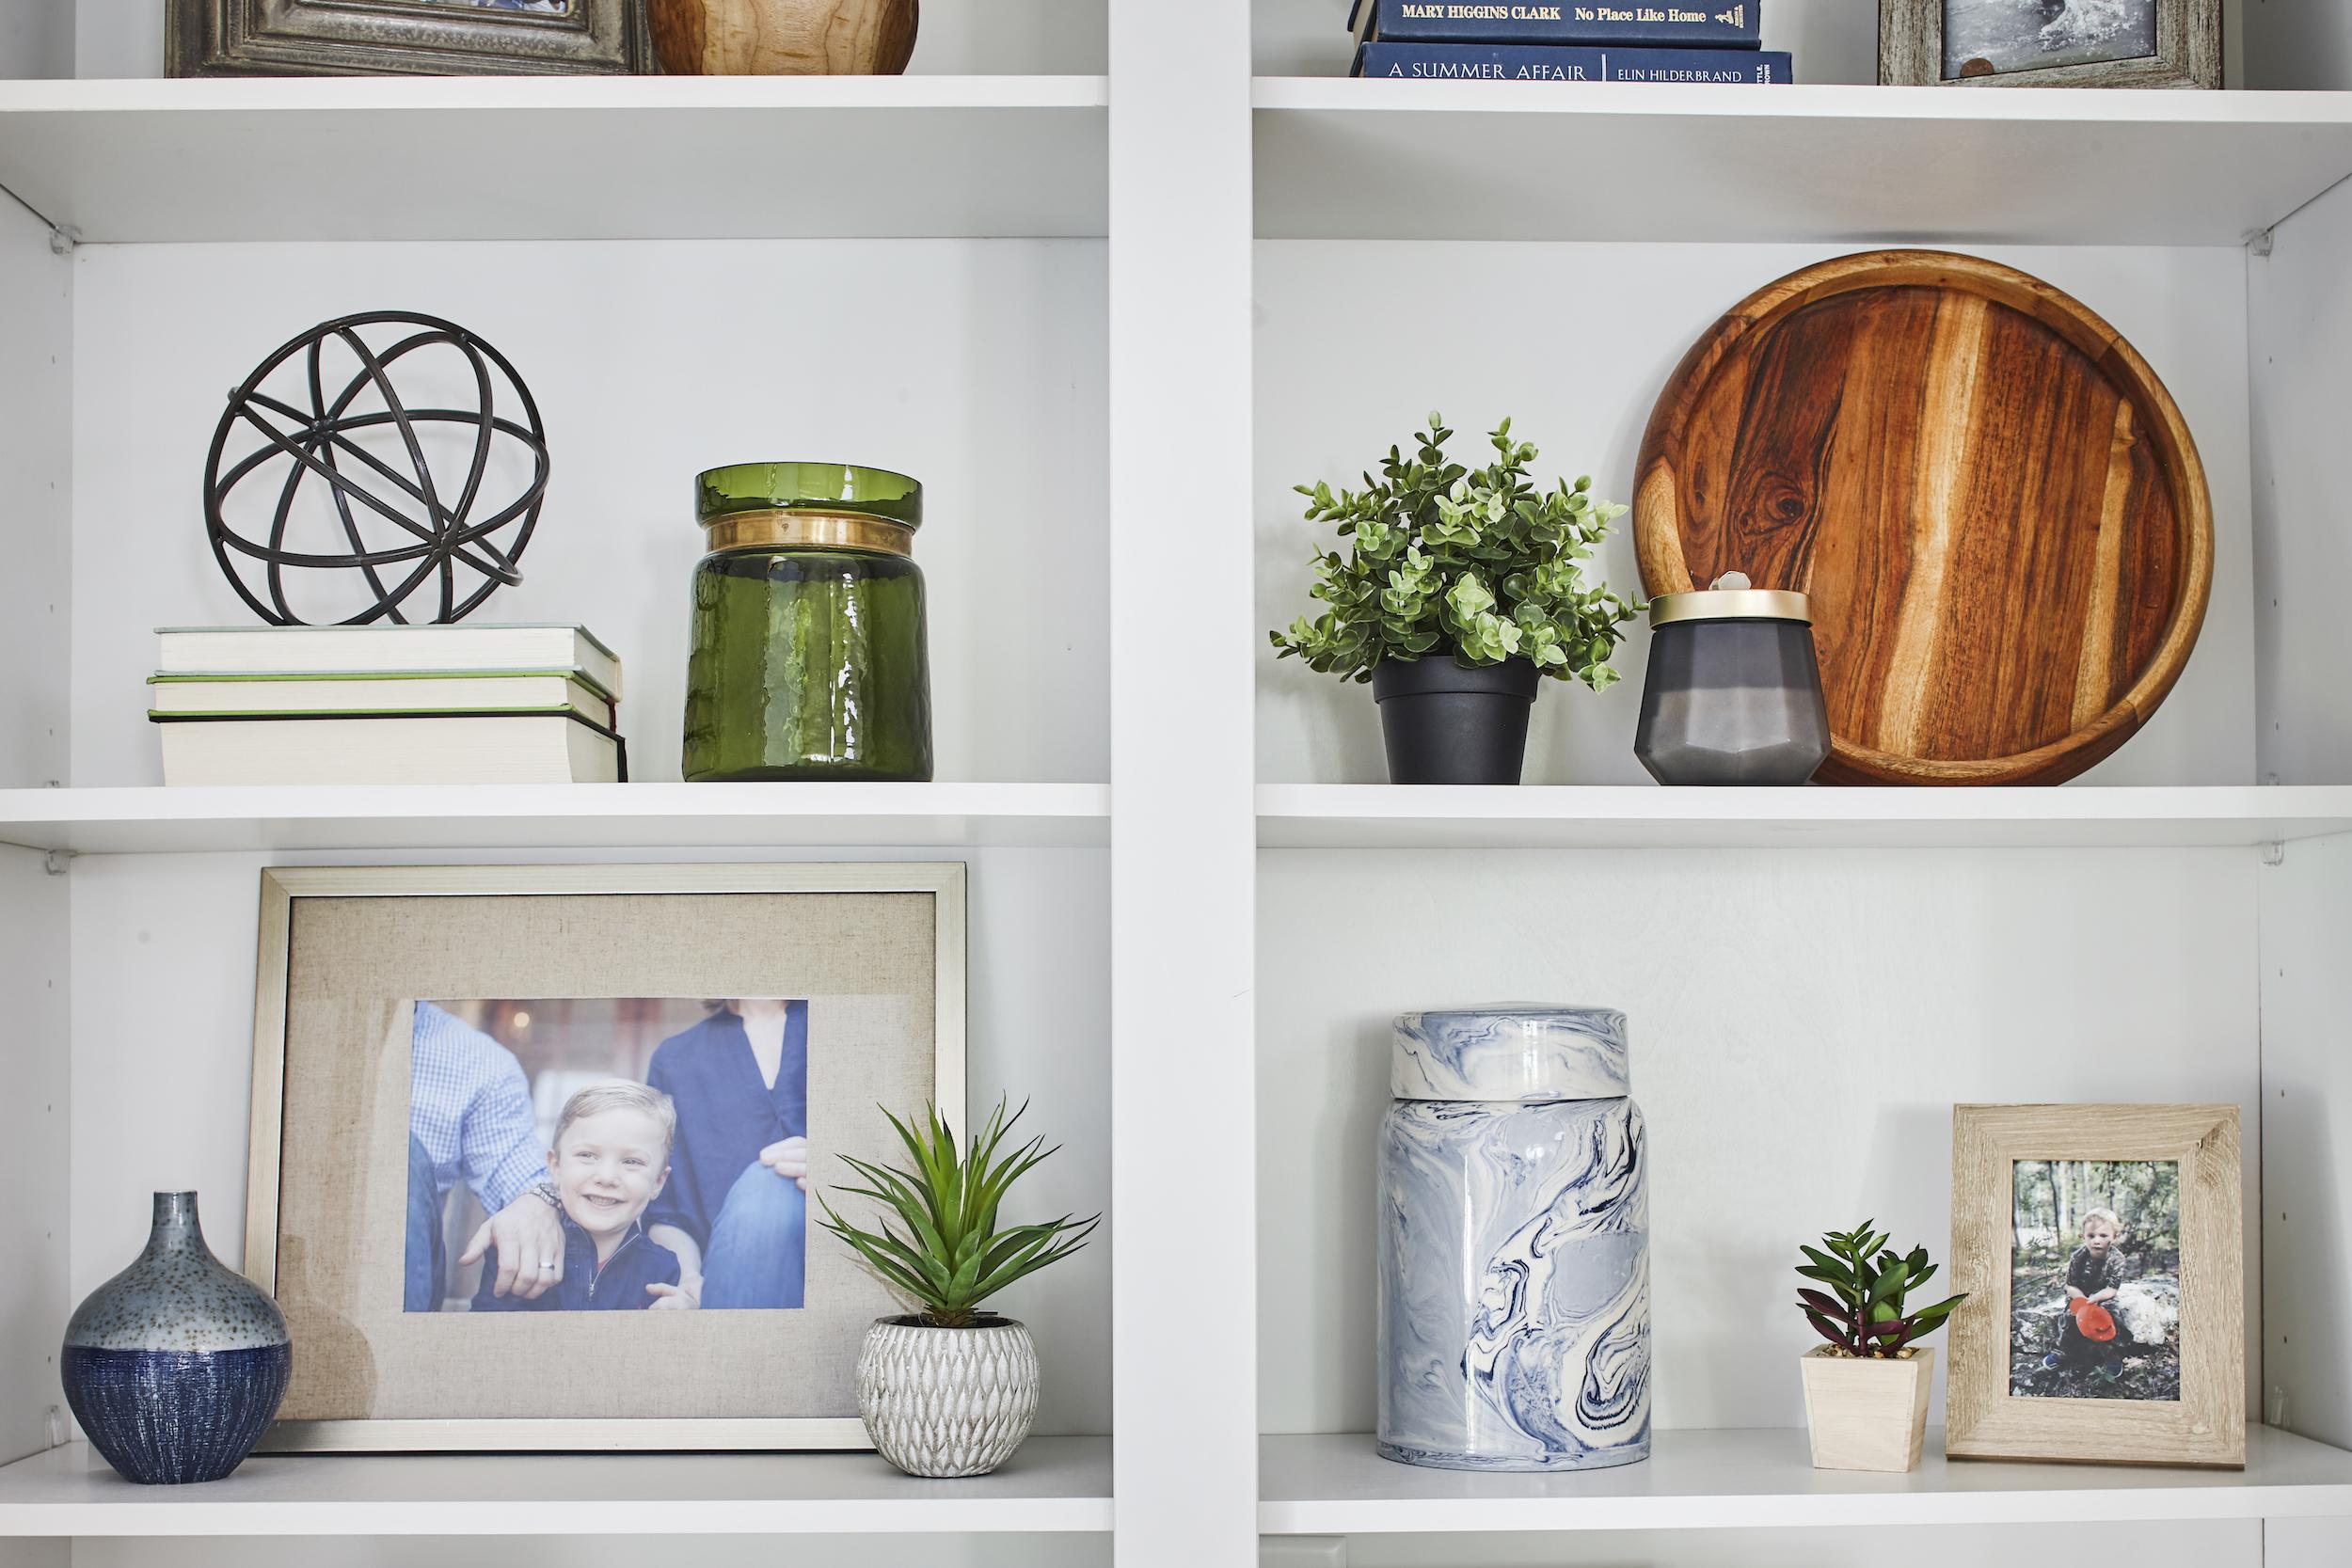 Bookshelf styling 3a design studio.jpg